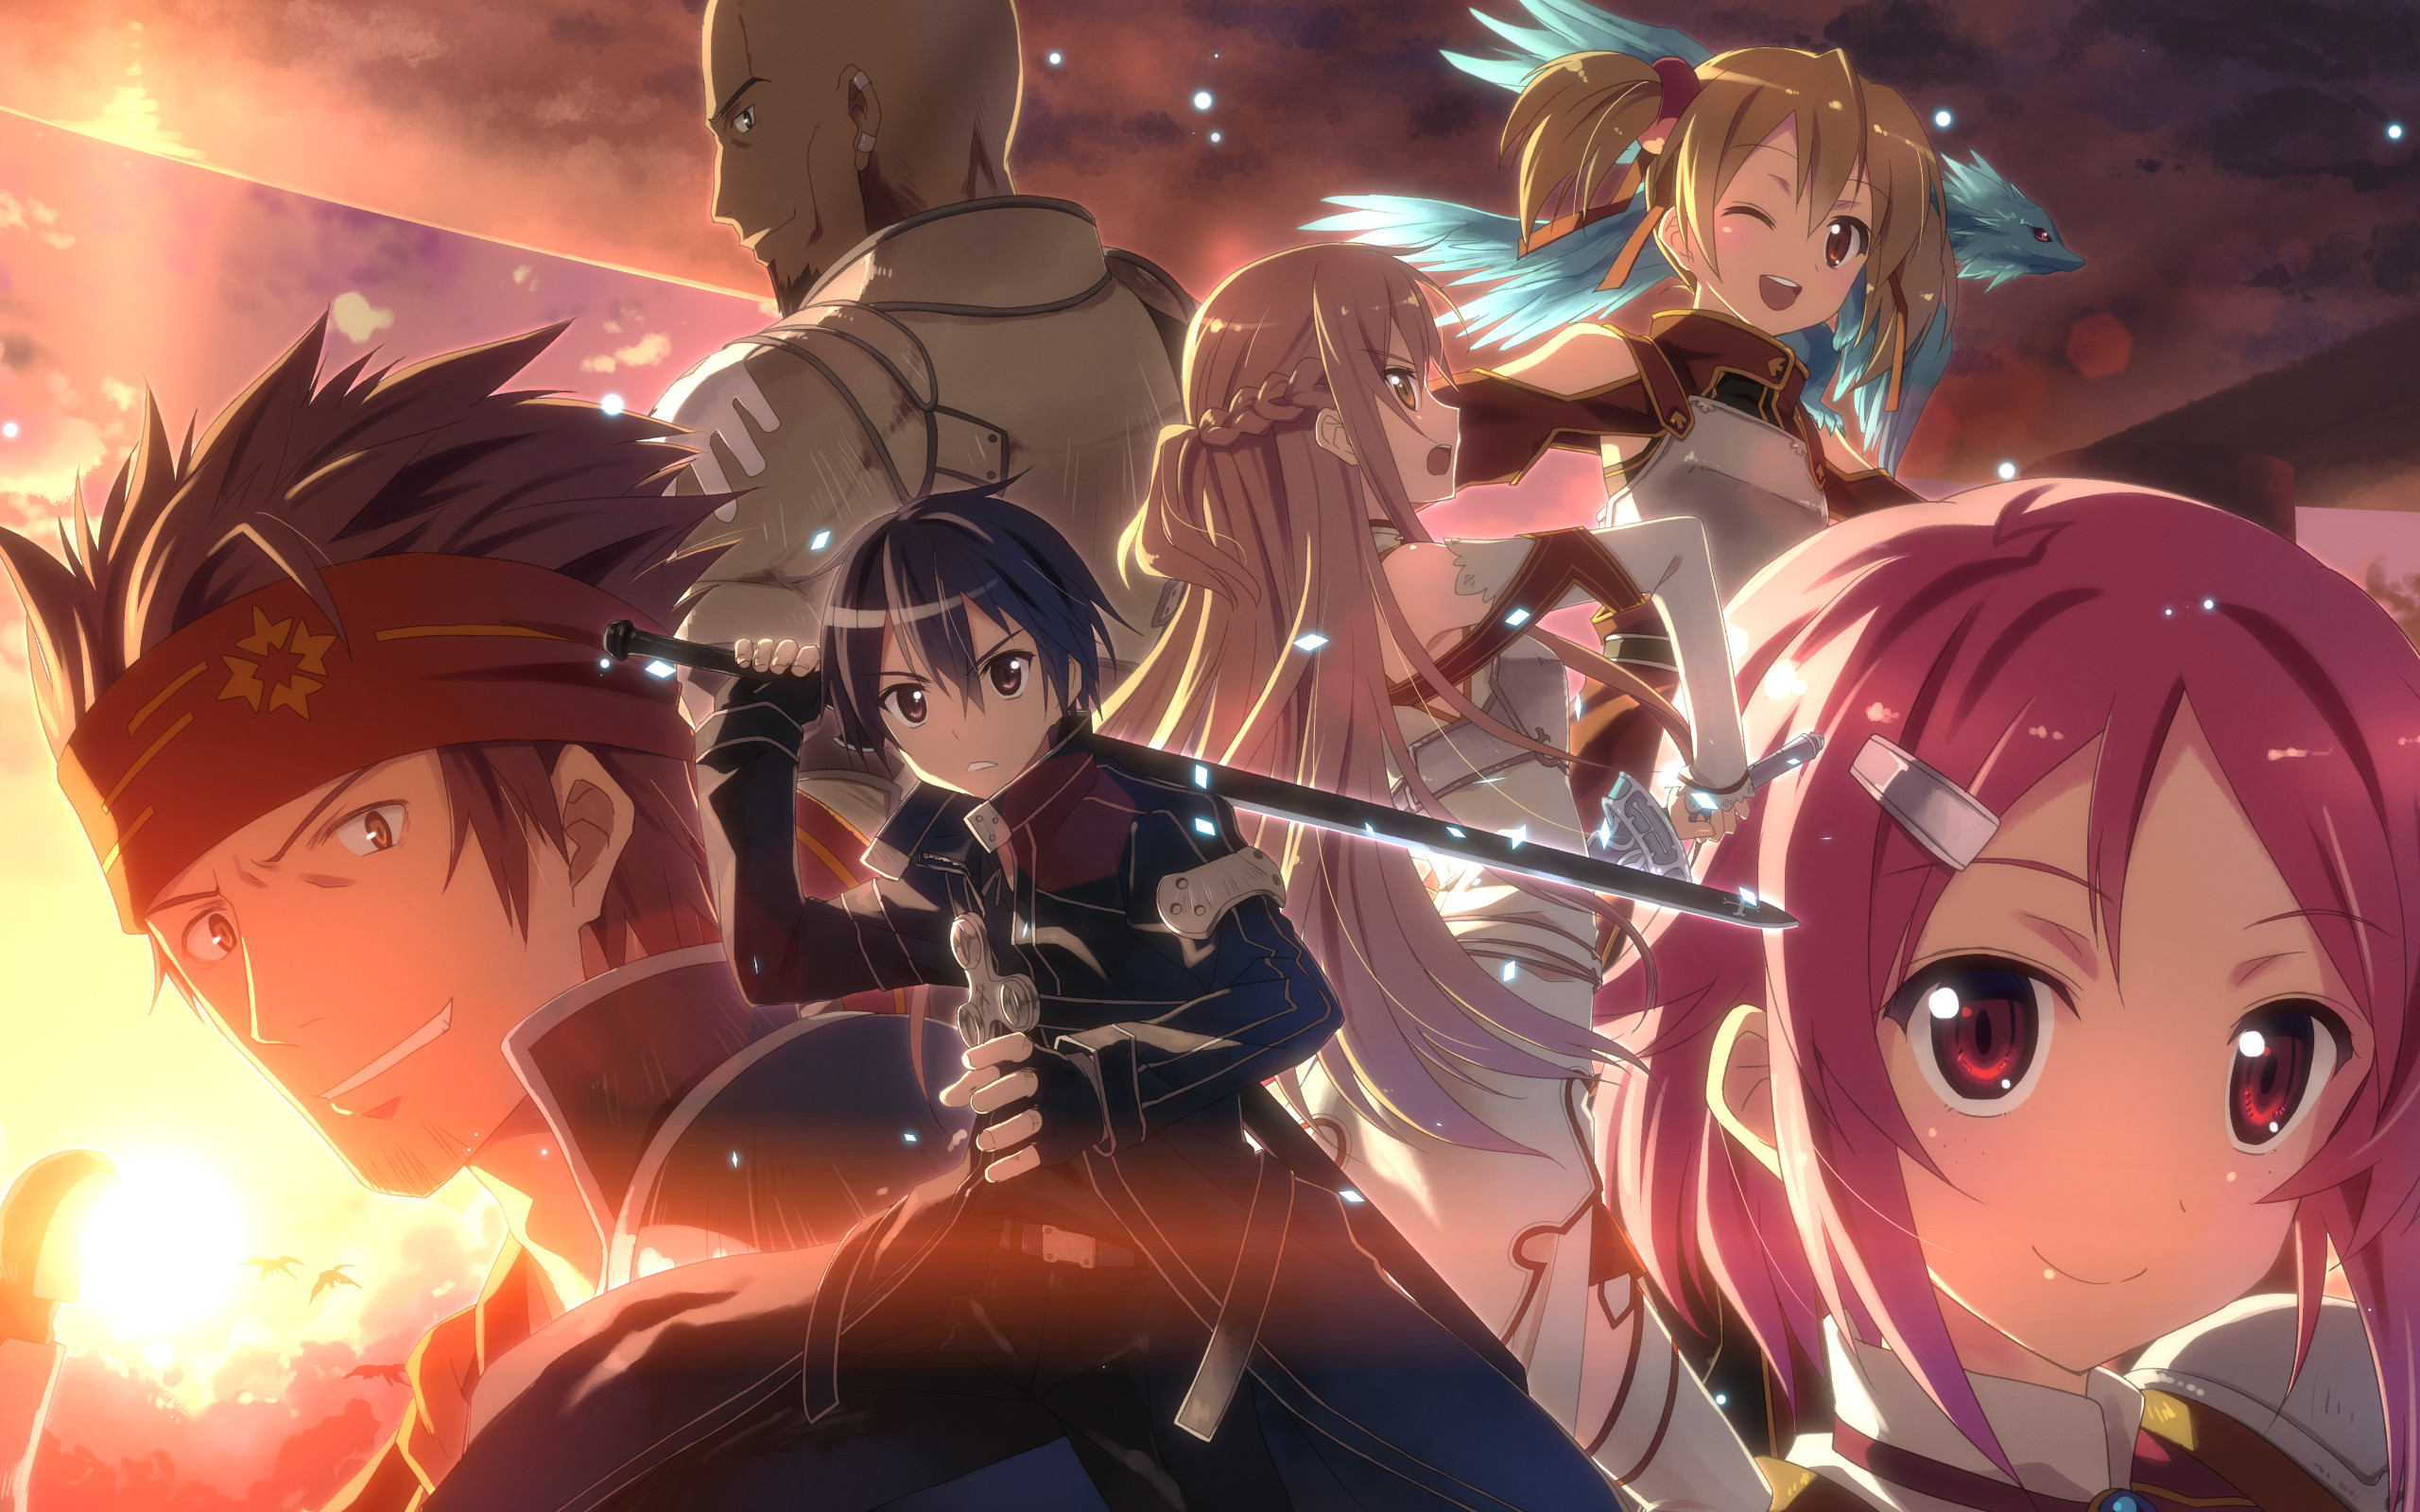 Anime – Sword Art Online Silica (Sword Art Online) Lisbeth (Sword Art Online